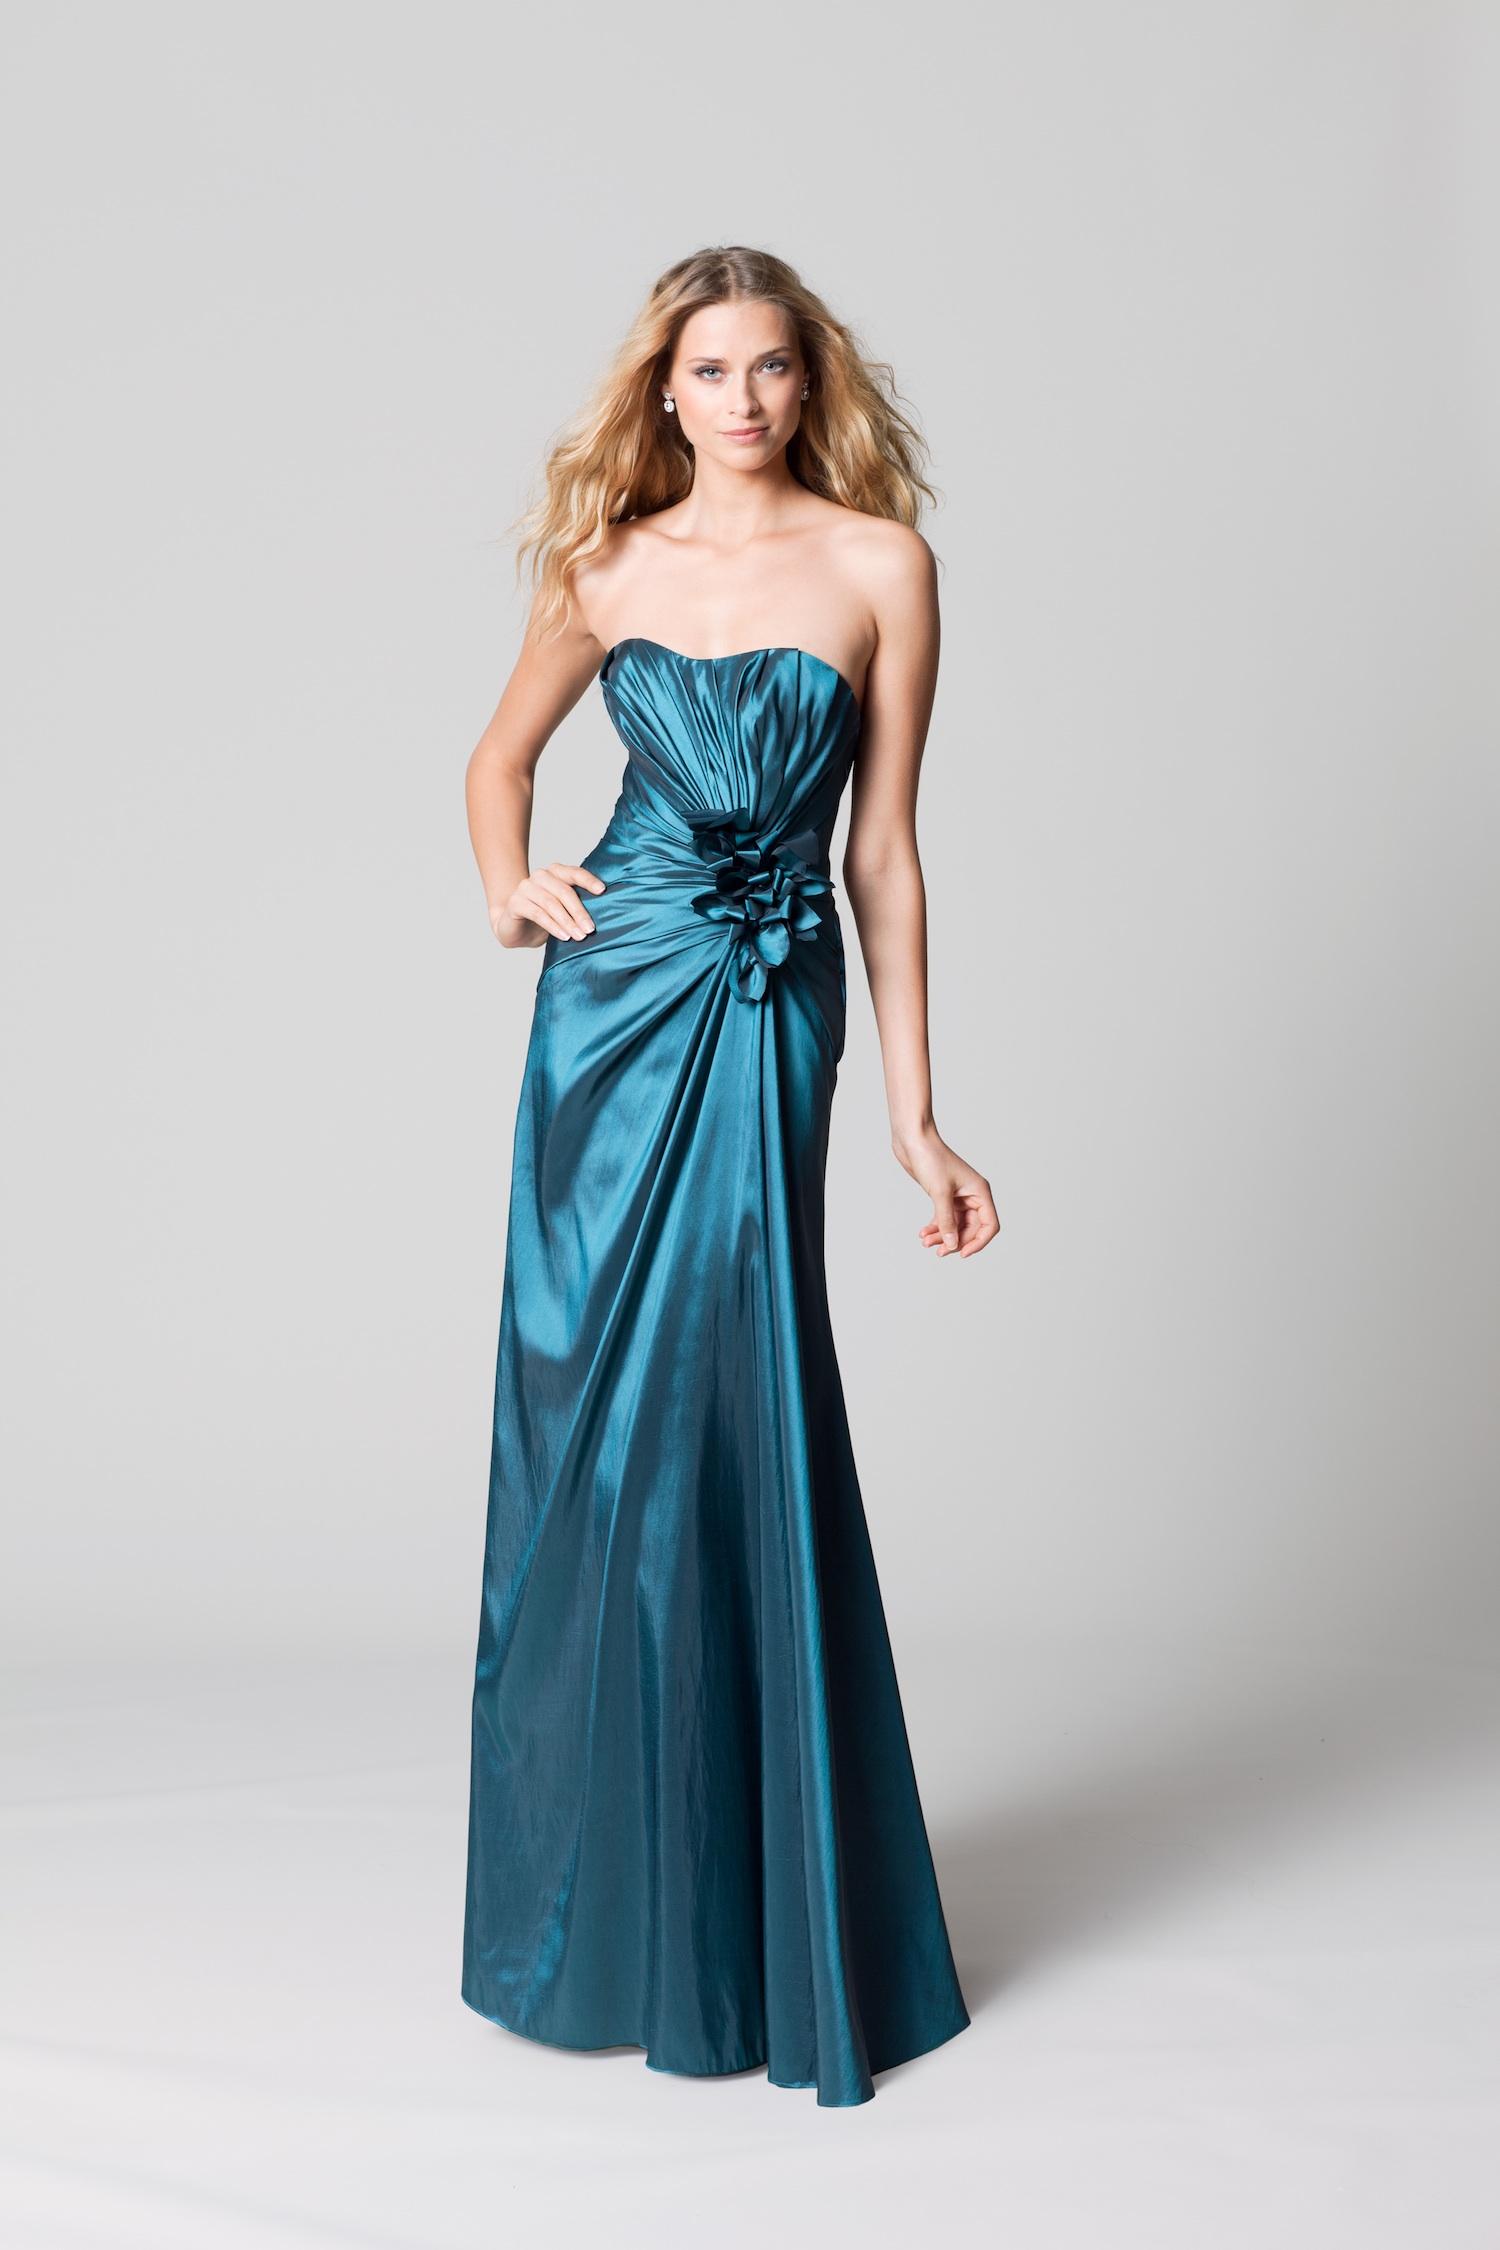 Teal Long Dresses